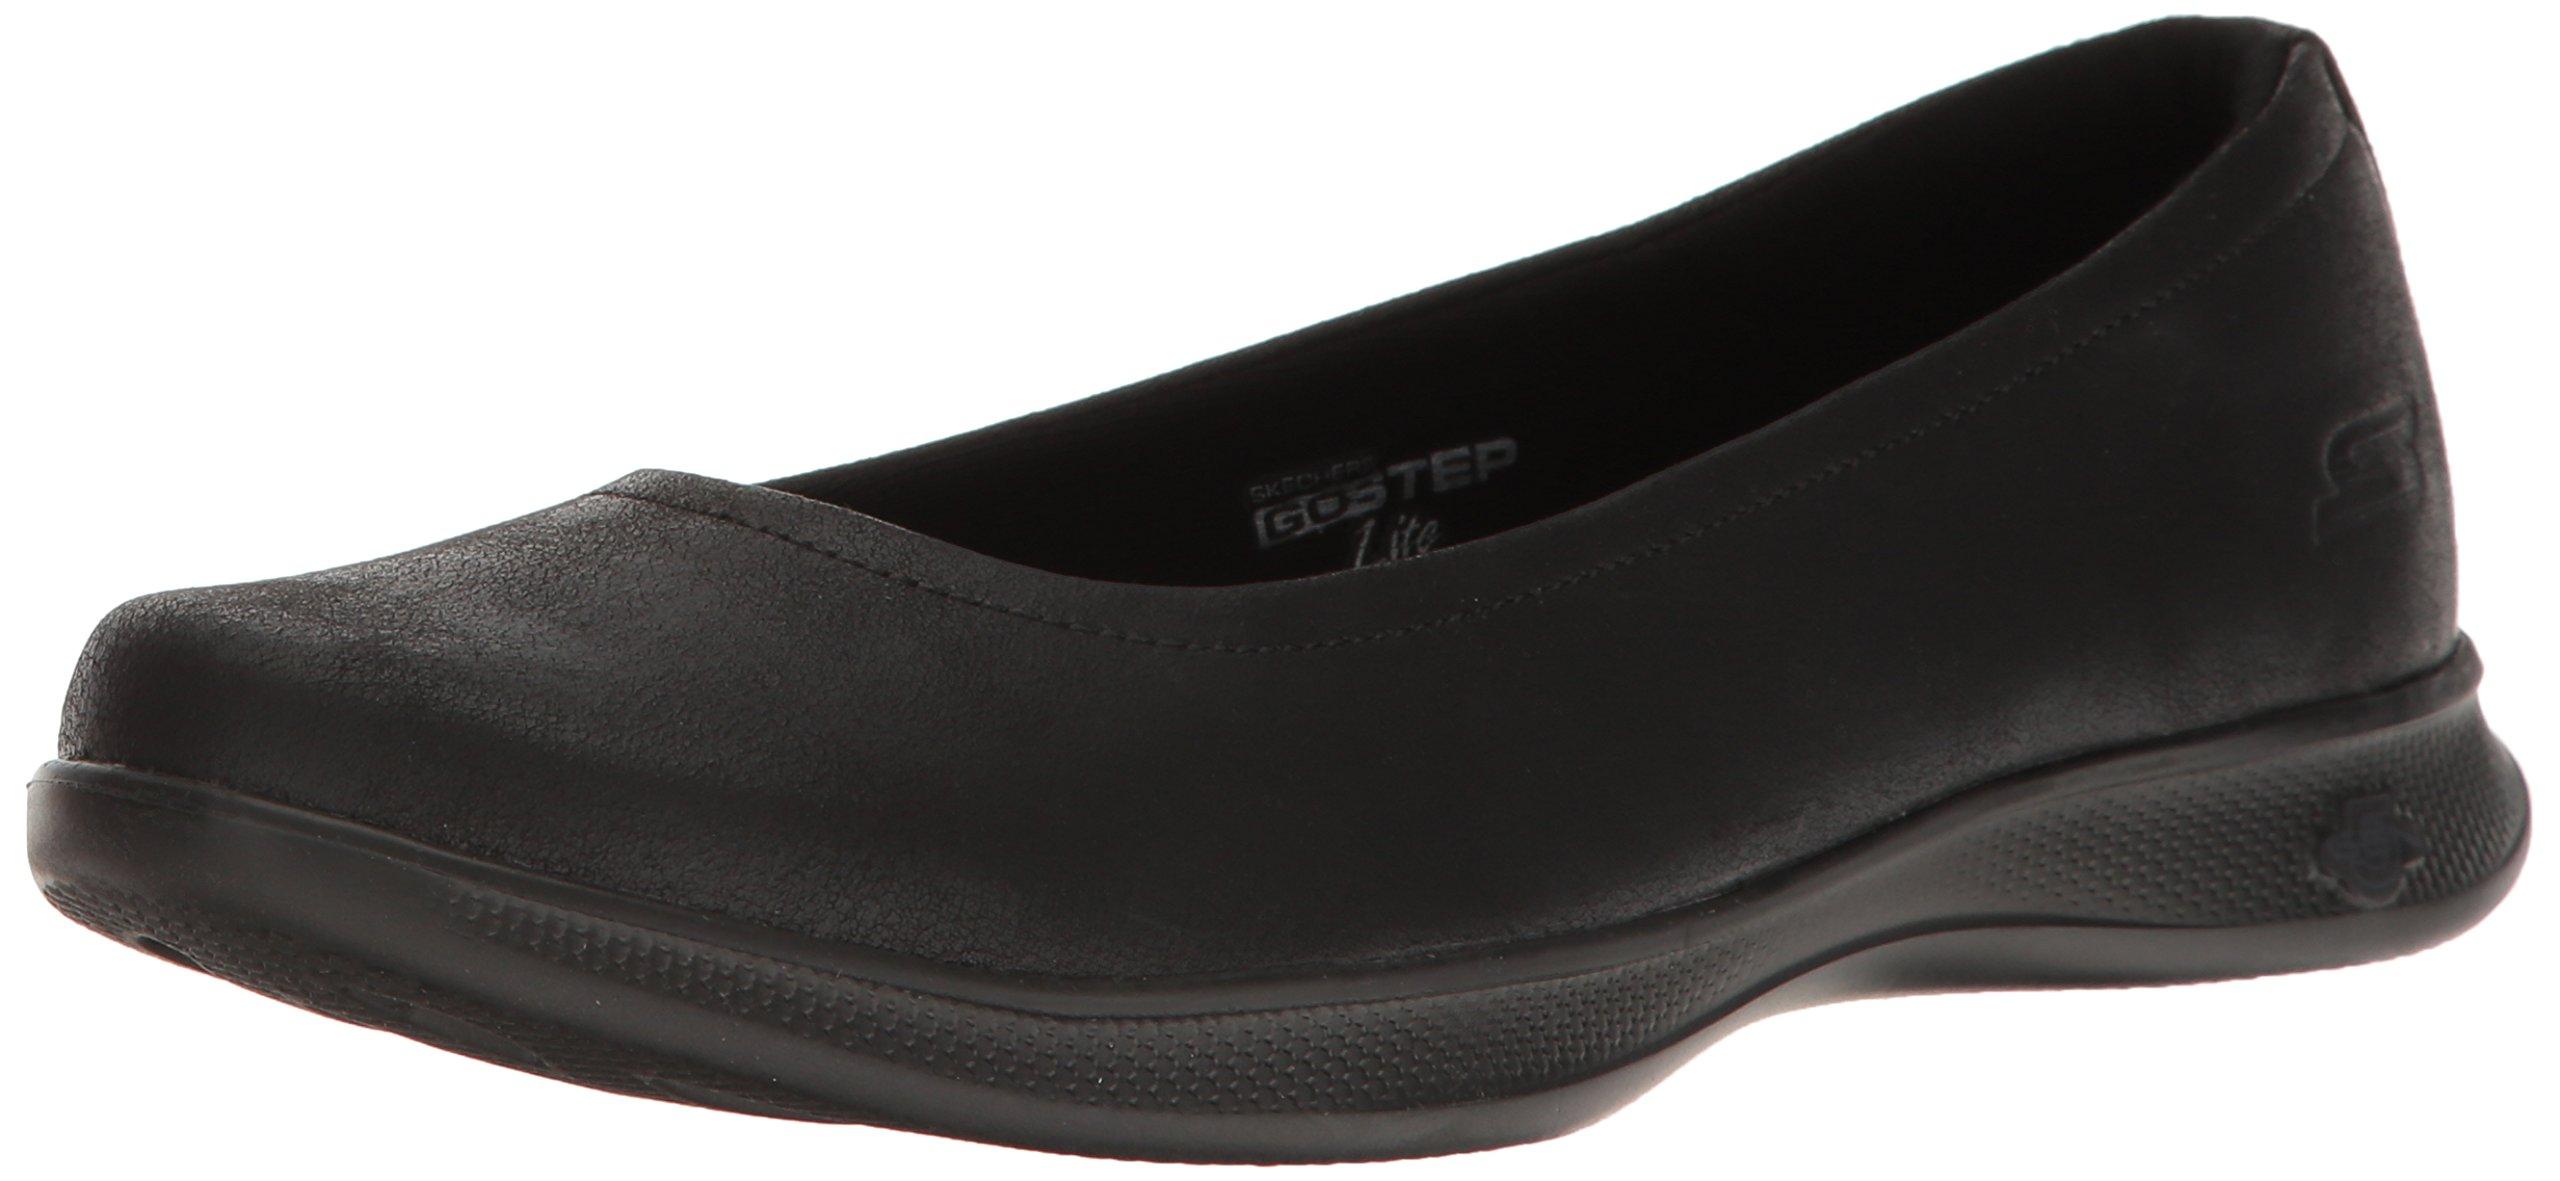 Skechers Performance Women's Go Step Lite-Mystic Walking Shoe,Black,9.5 M US